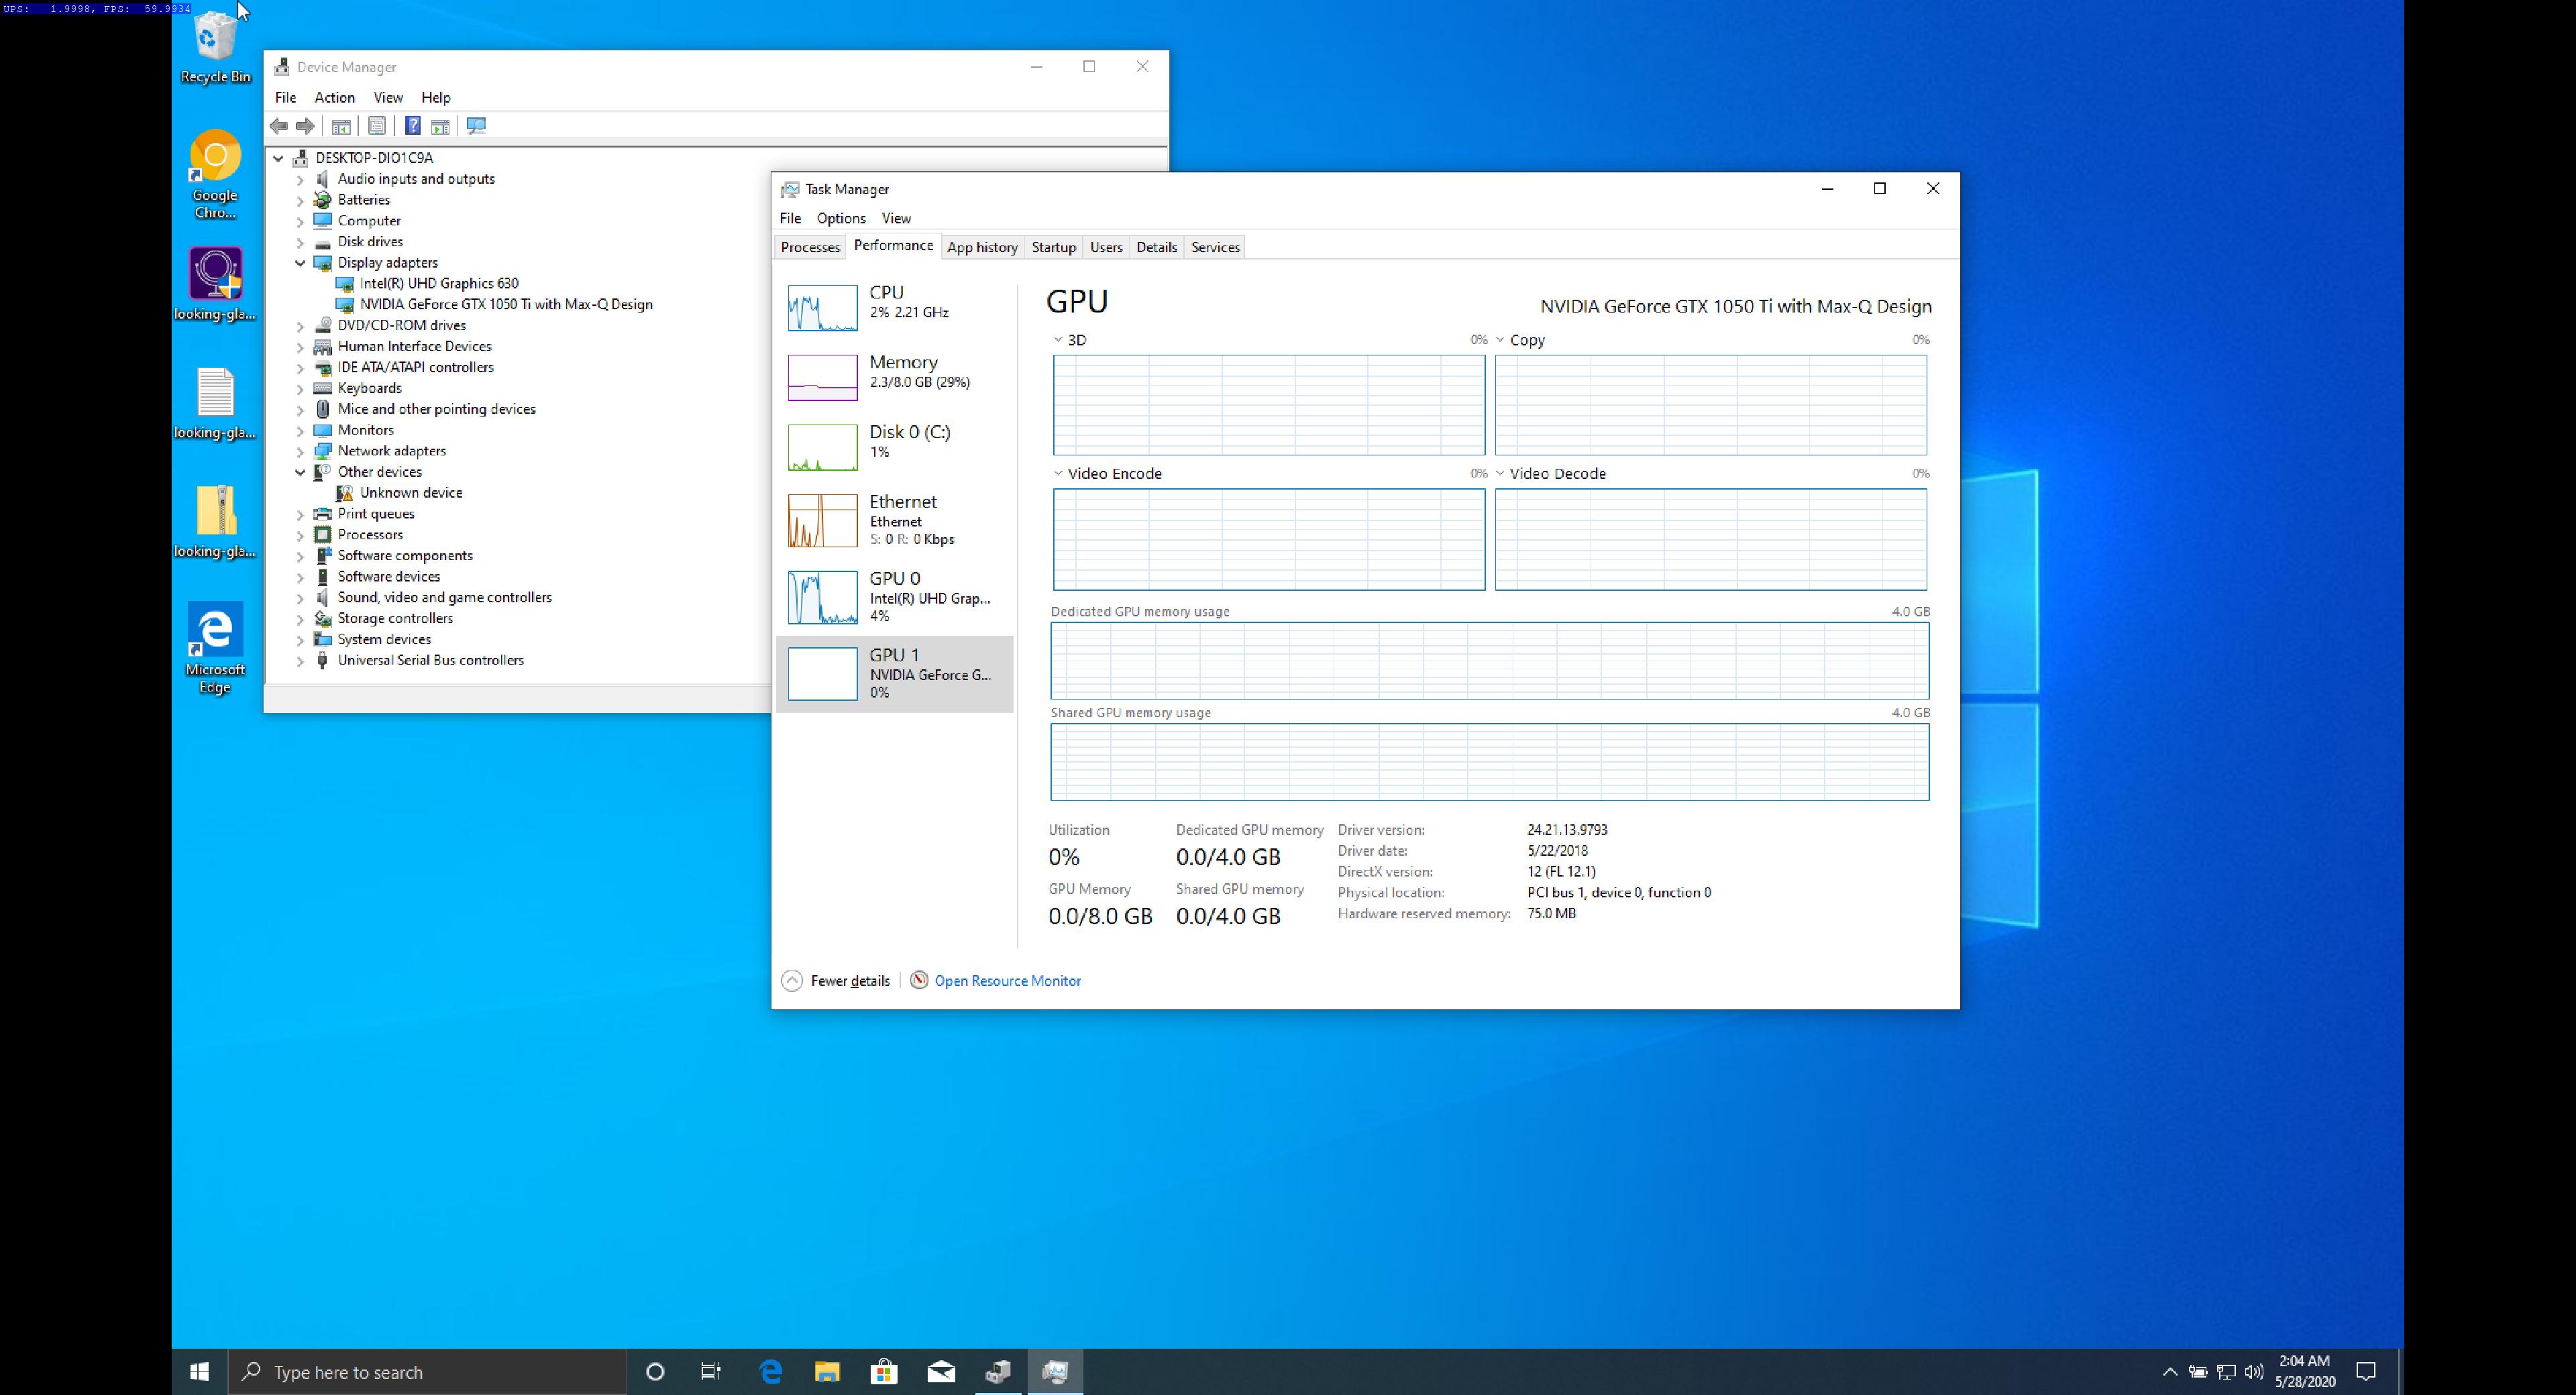 Screenshot_2020-05-28_02-05-05